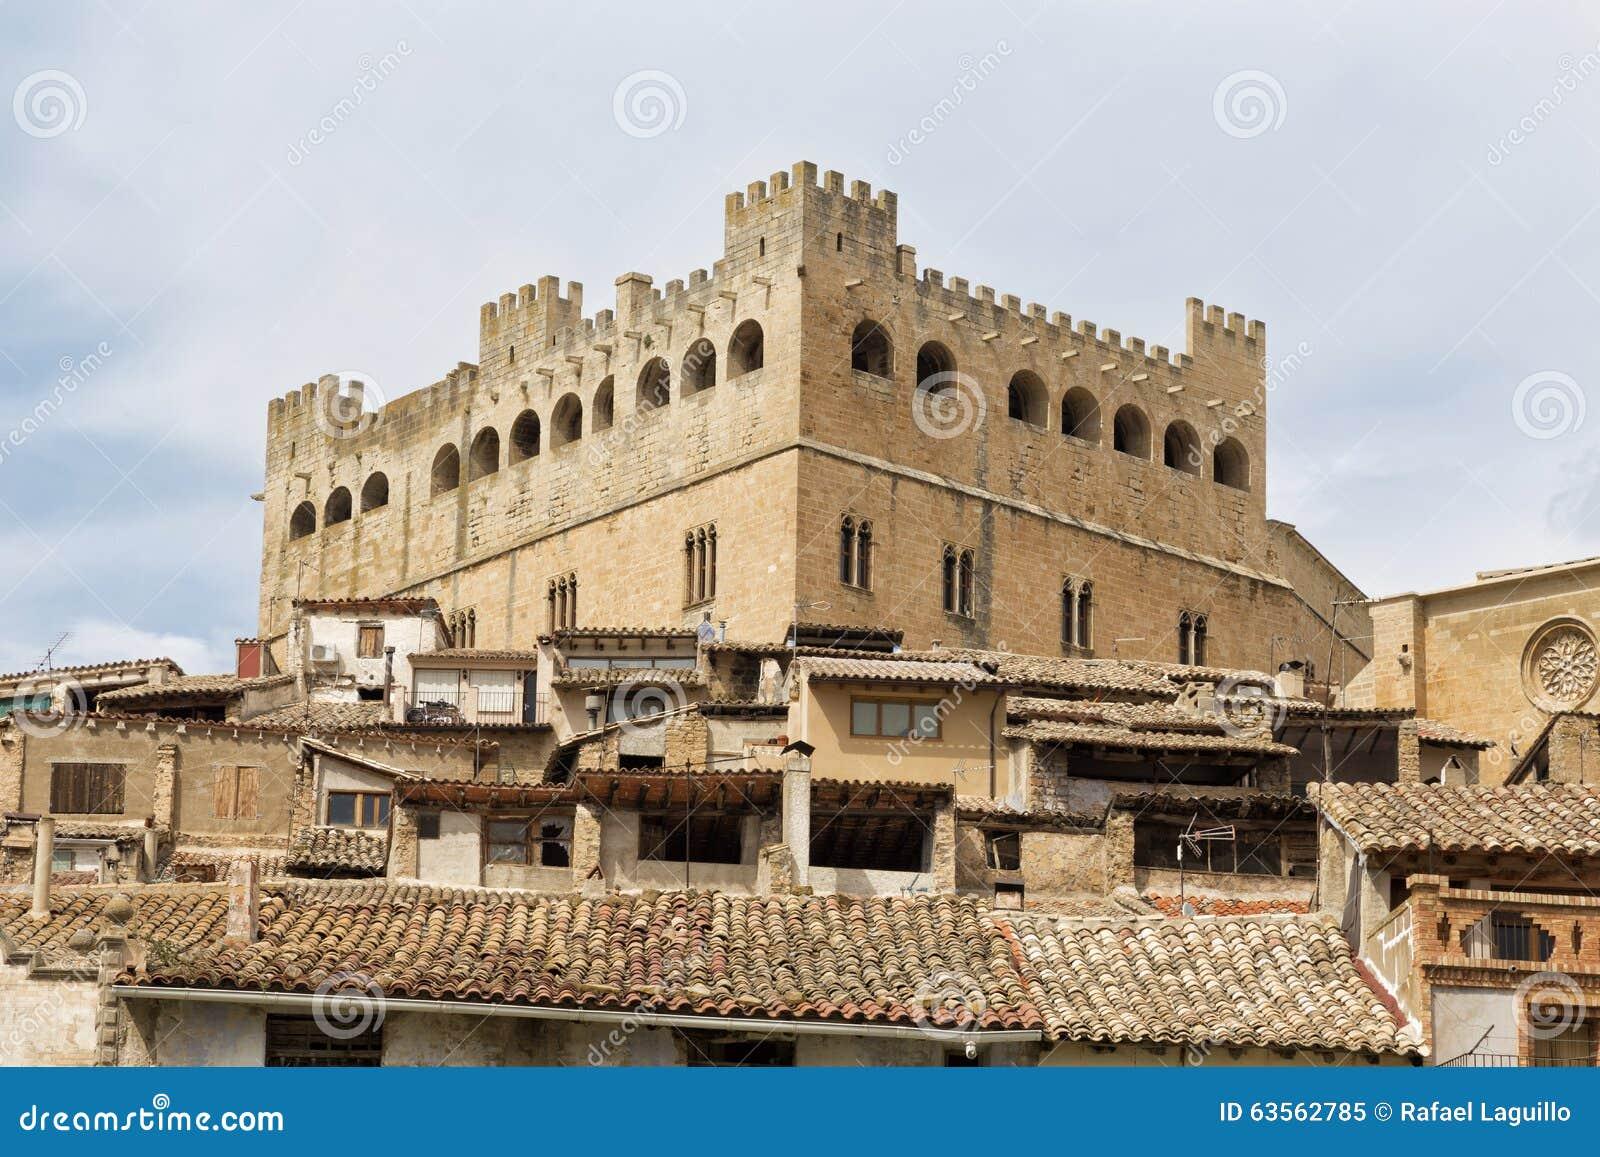 Castle of Valderrobres